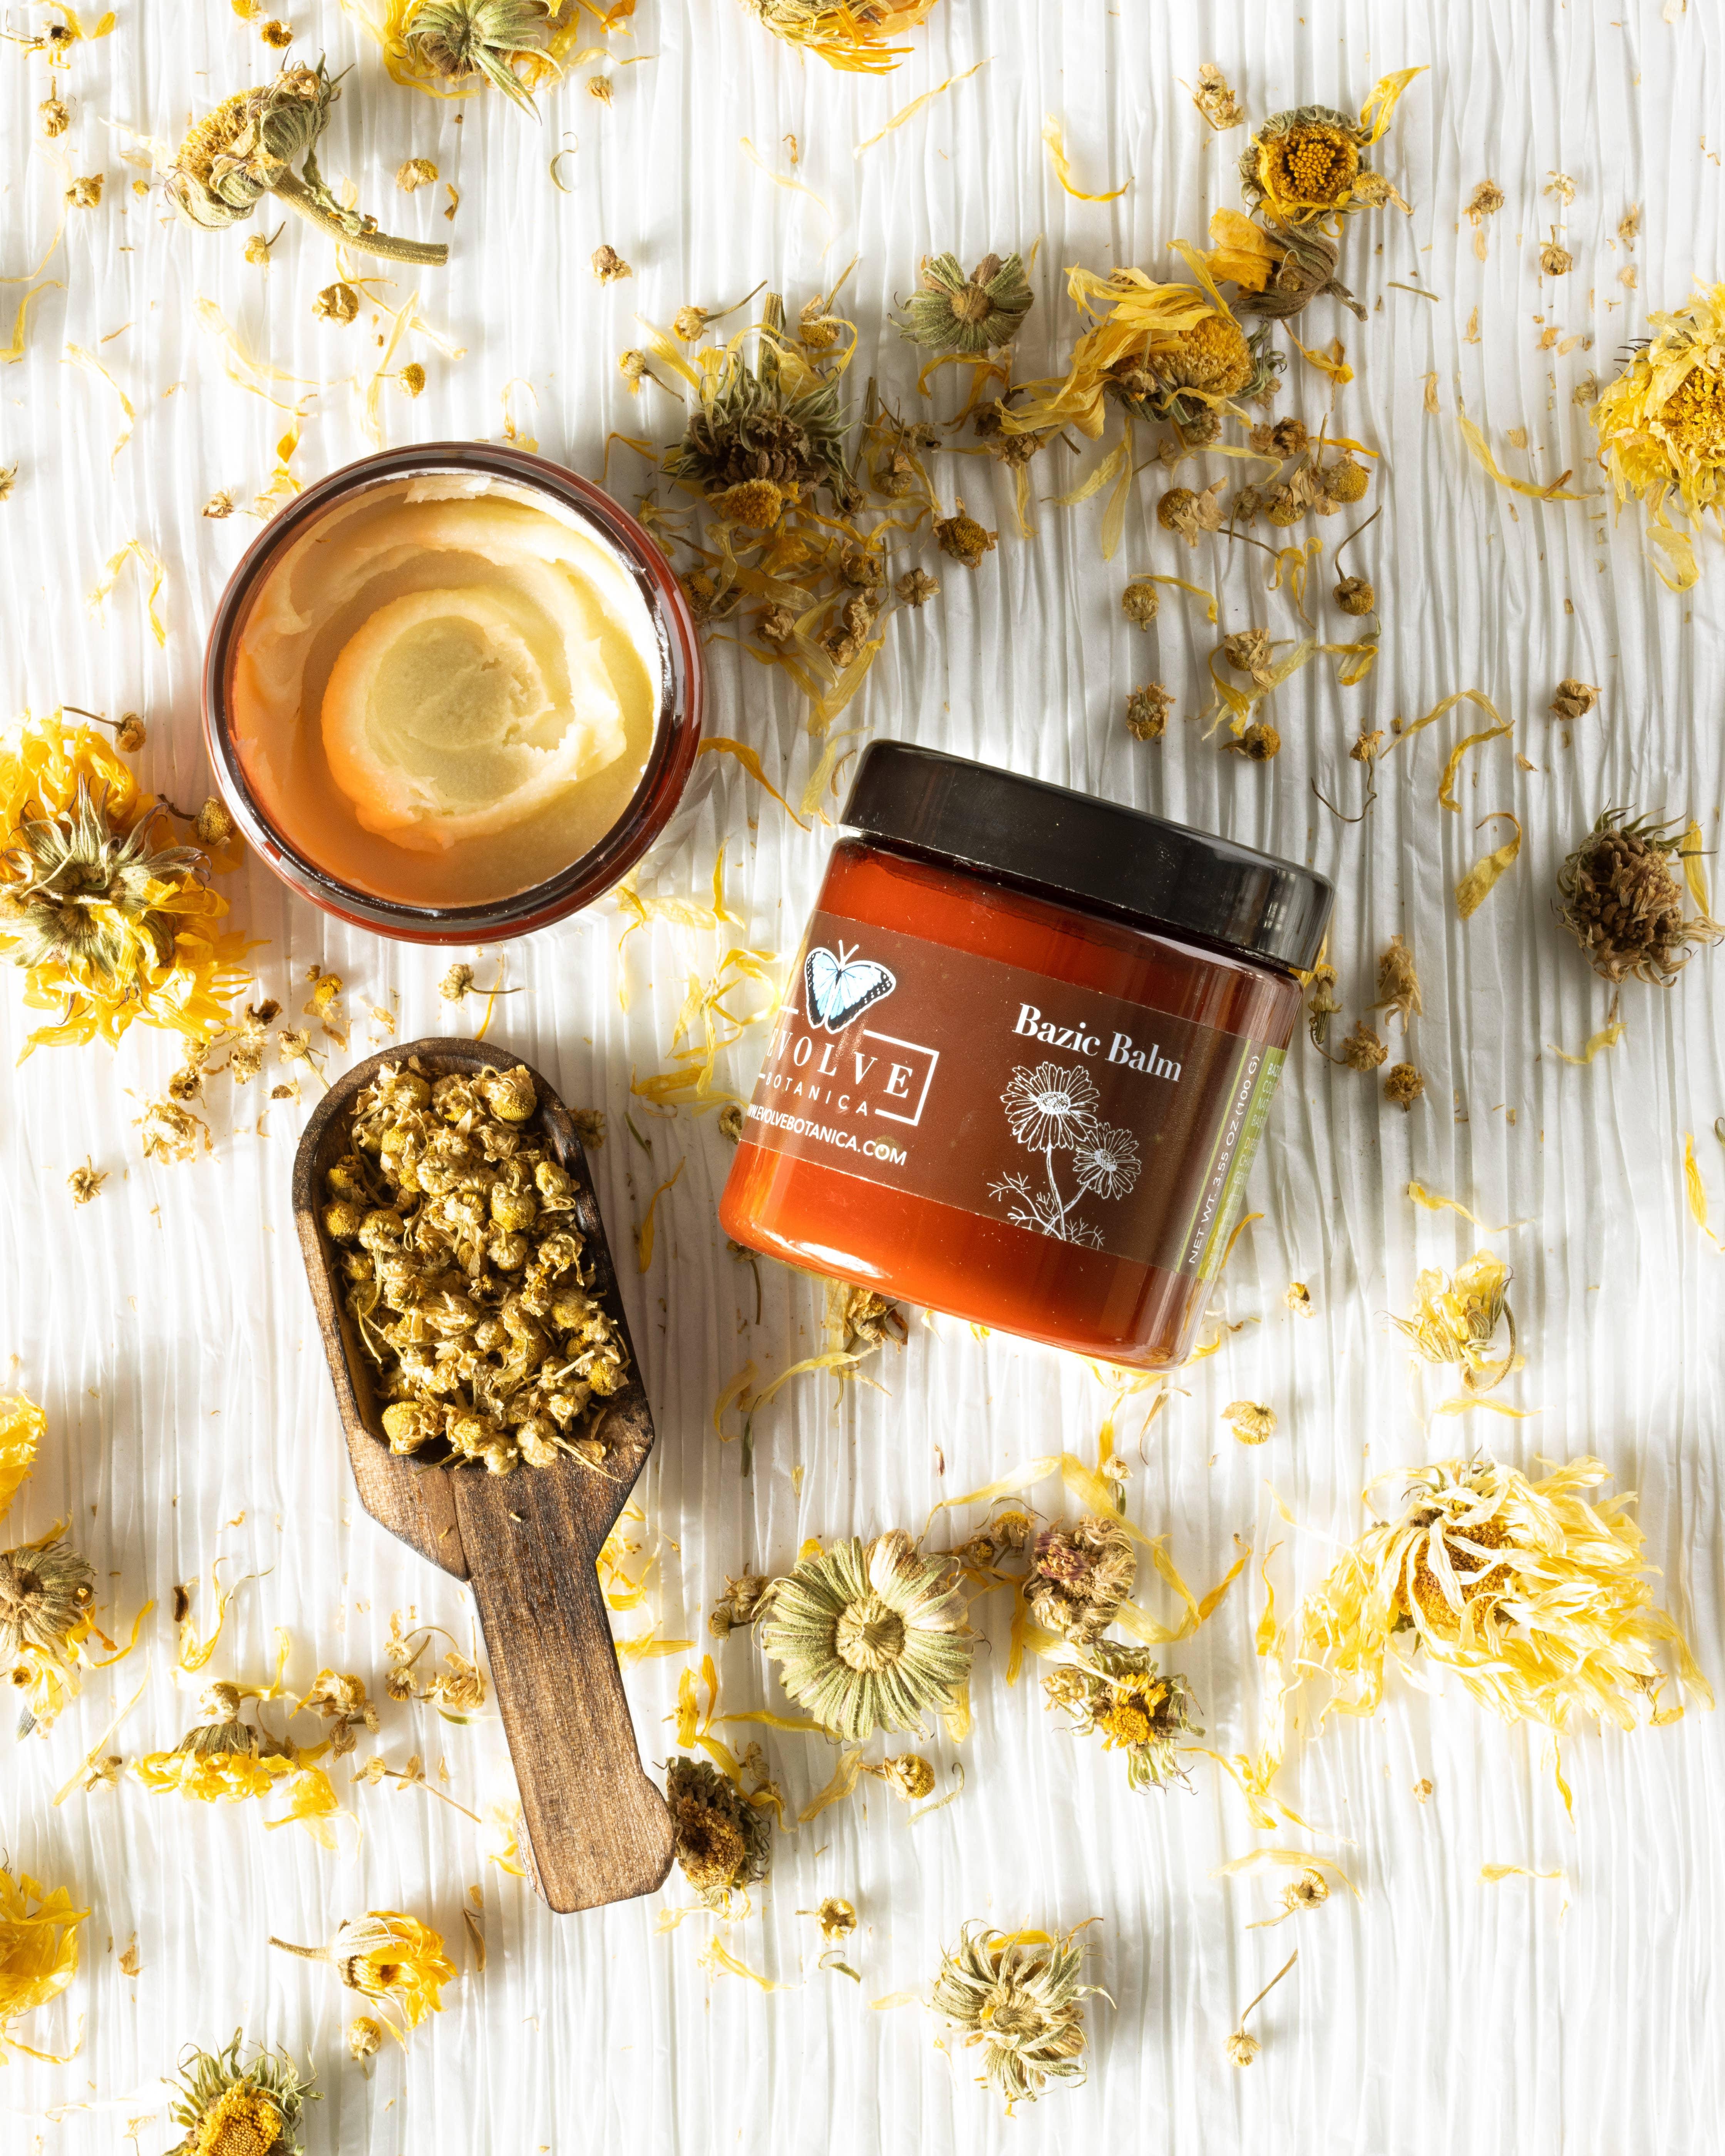 Evolve - Skincare - Bazic Balm (3.5 oz Jar) - | Trada Marketplace